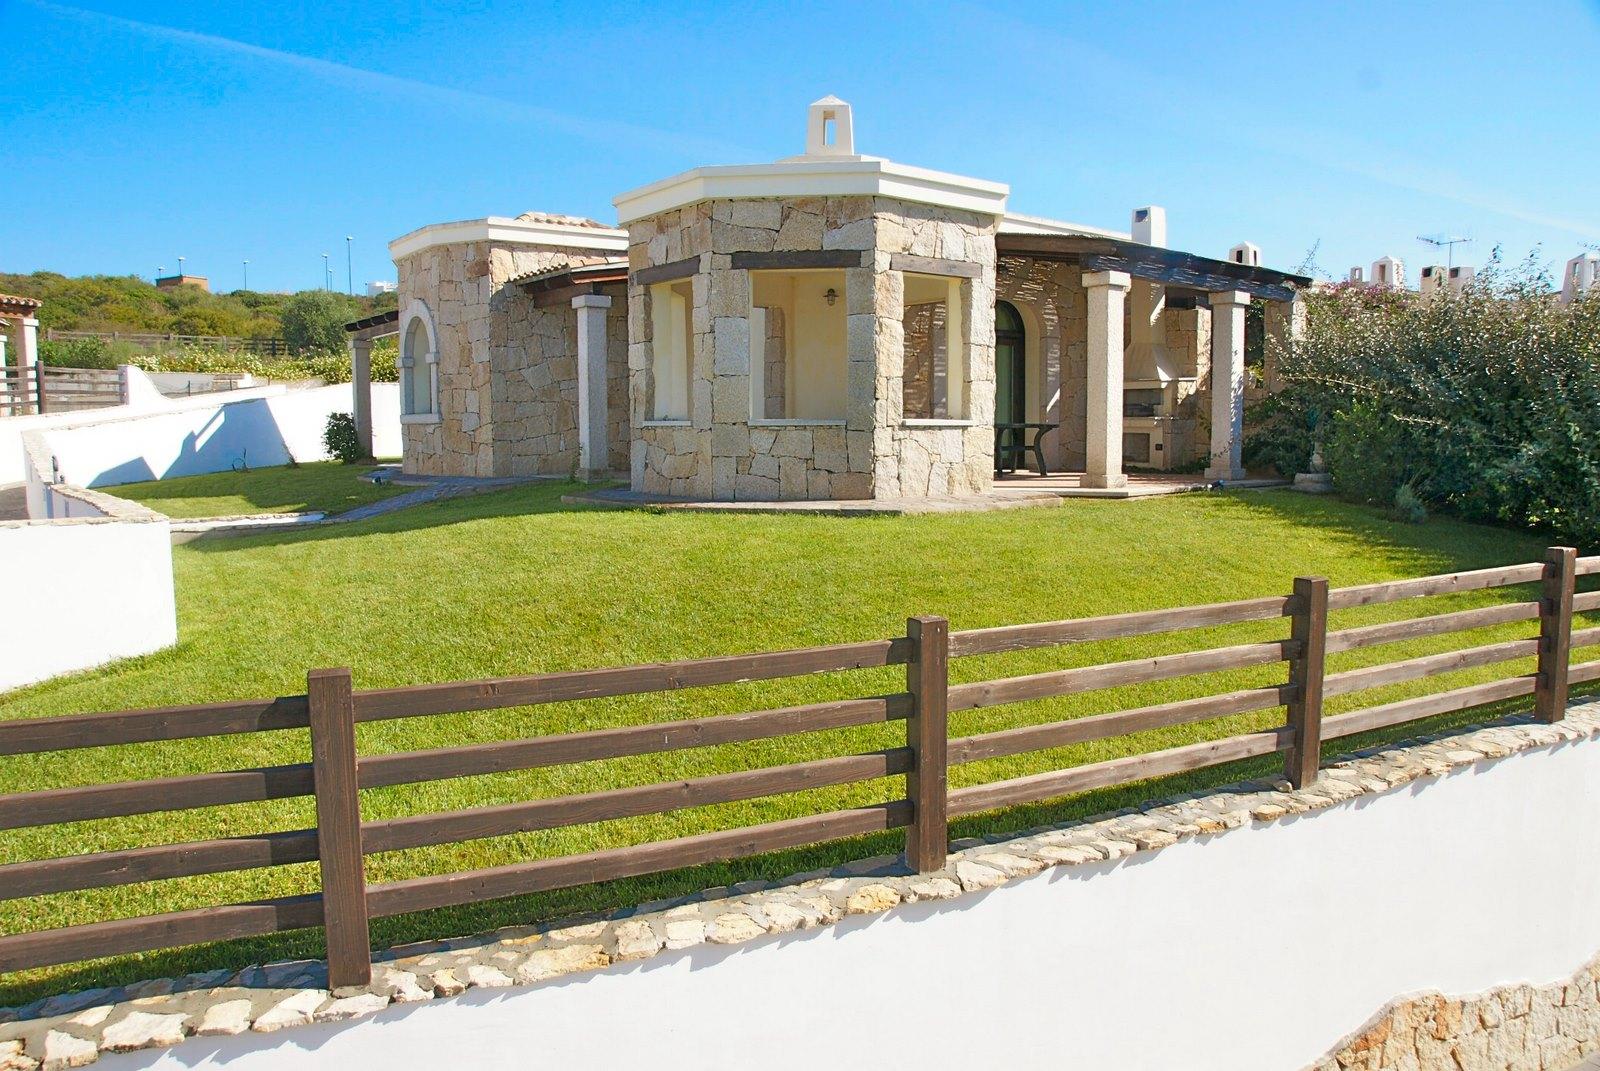 Ferienhaus Carru (877335), Sant Angelo Custode, Sassari, Sardinien, Italien, Bild 9